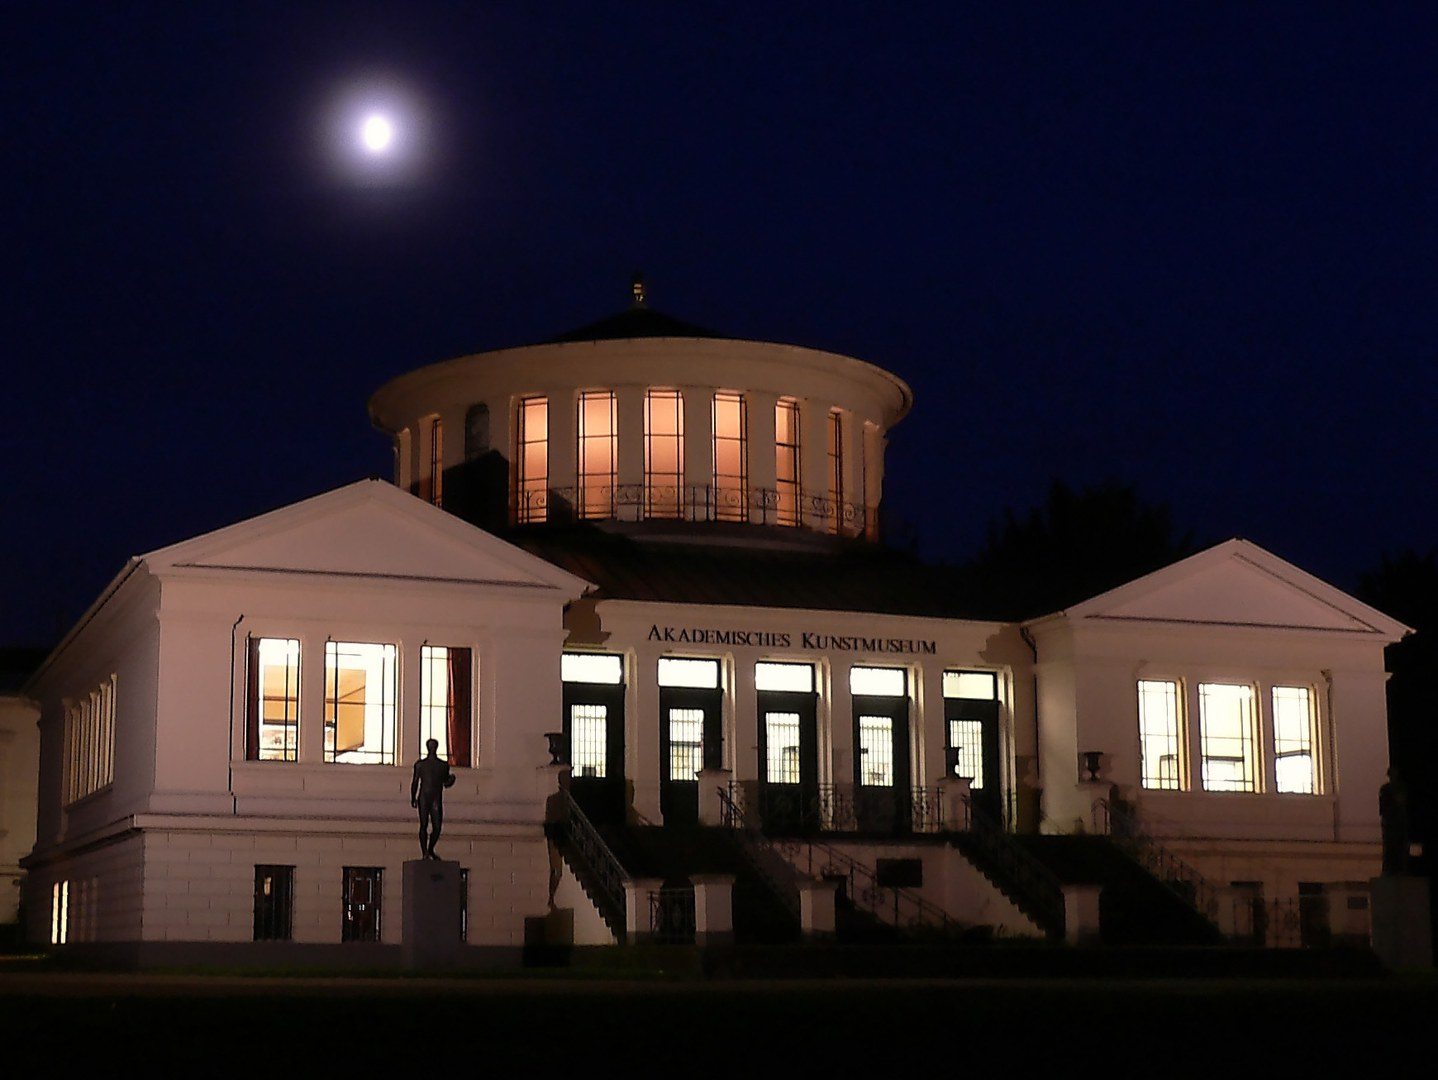 Akademisches Kunstmuseum: